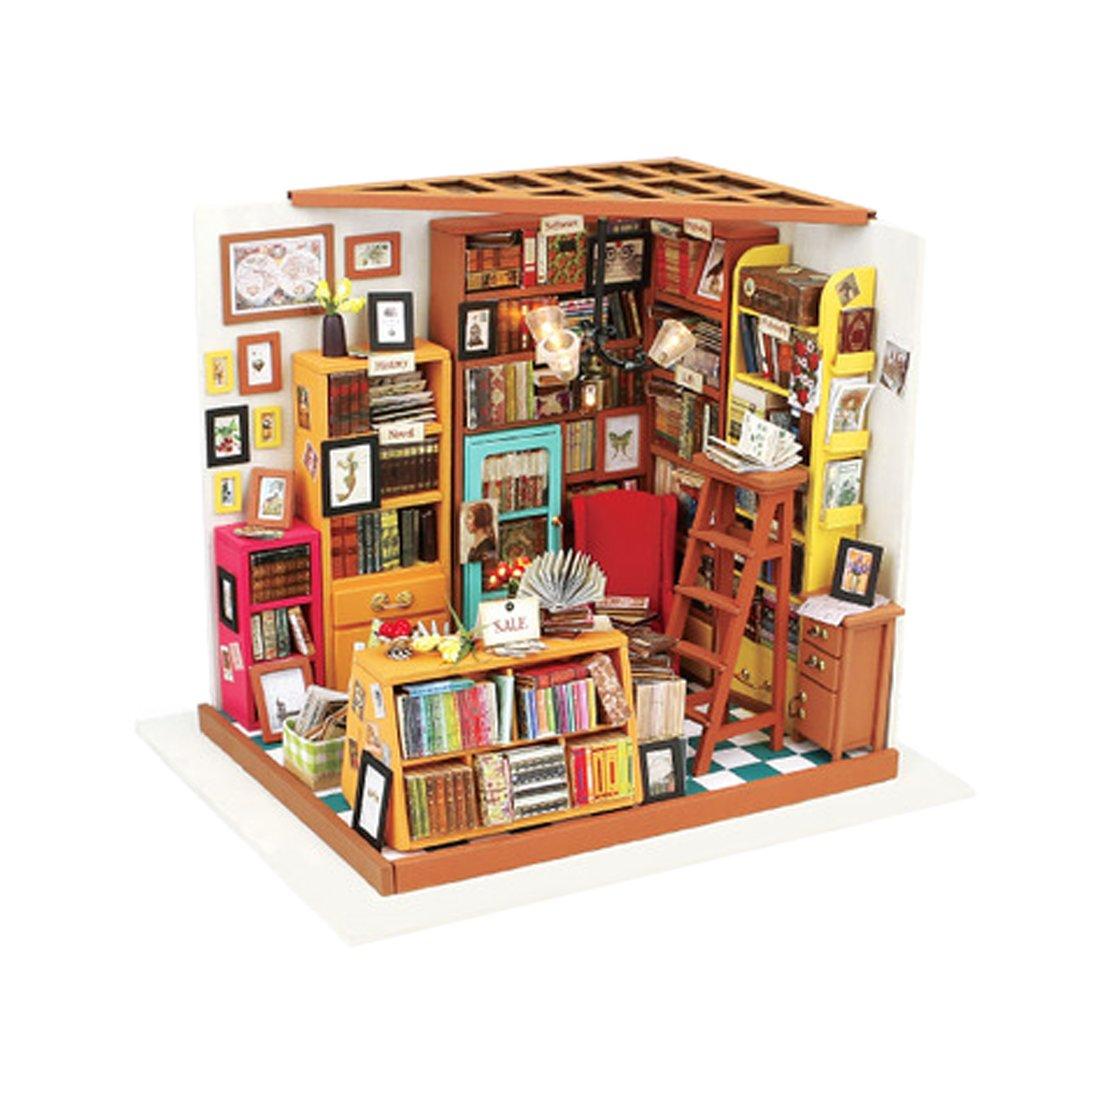 Kehuashina Dollhouse Creative Miniature DIY Library House Kits Best for Women & Men